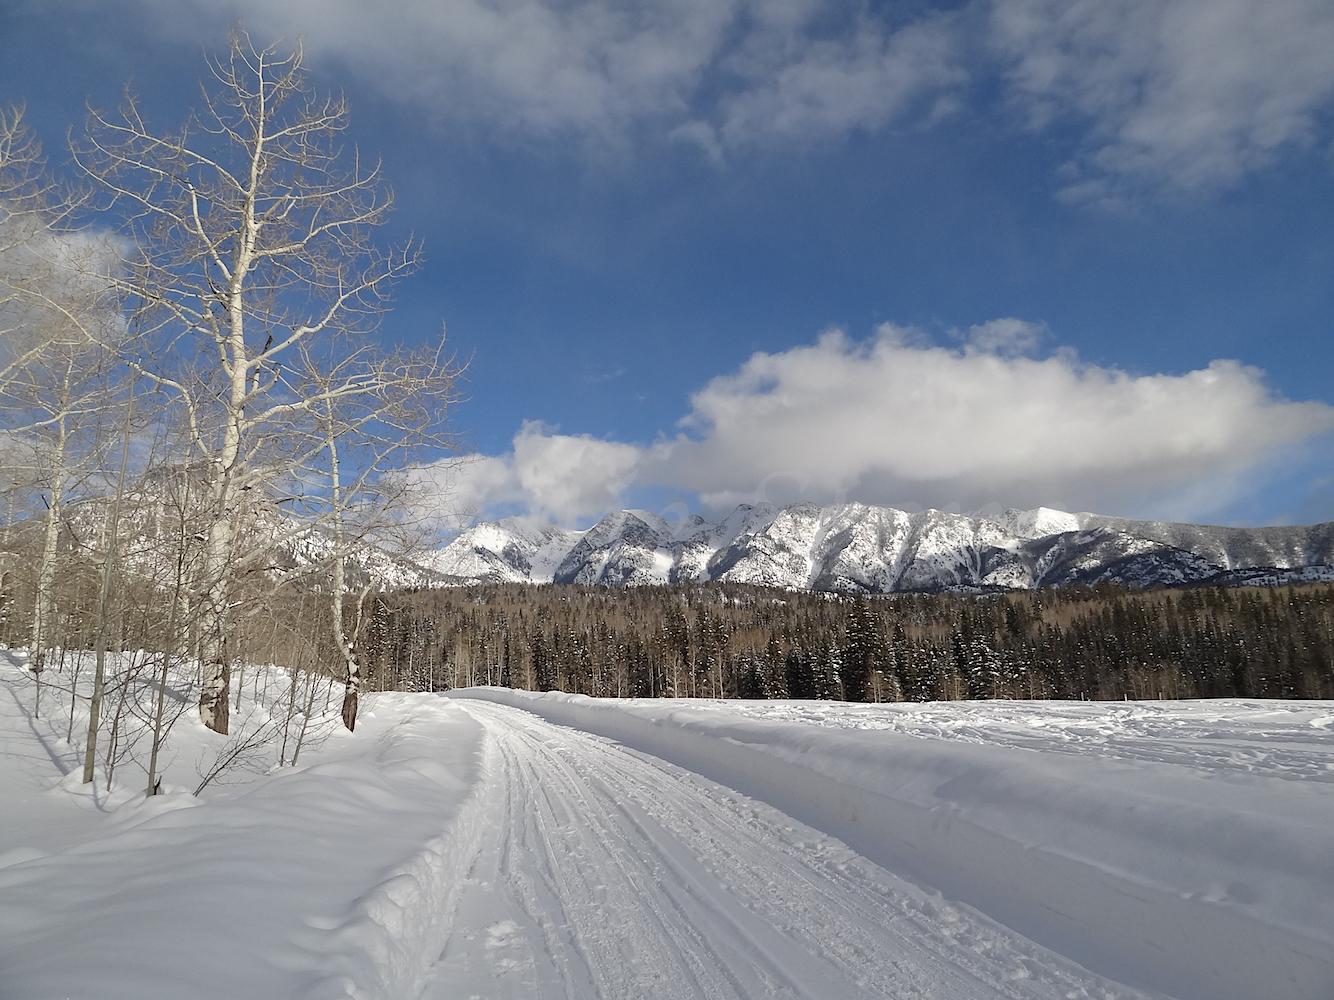 Lime Creek Road Snowshoe, Image #5459